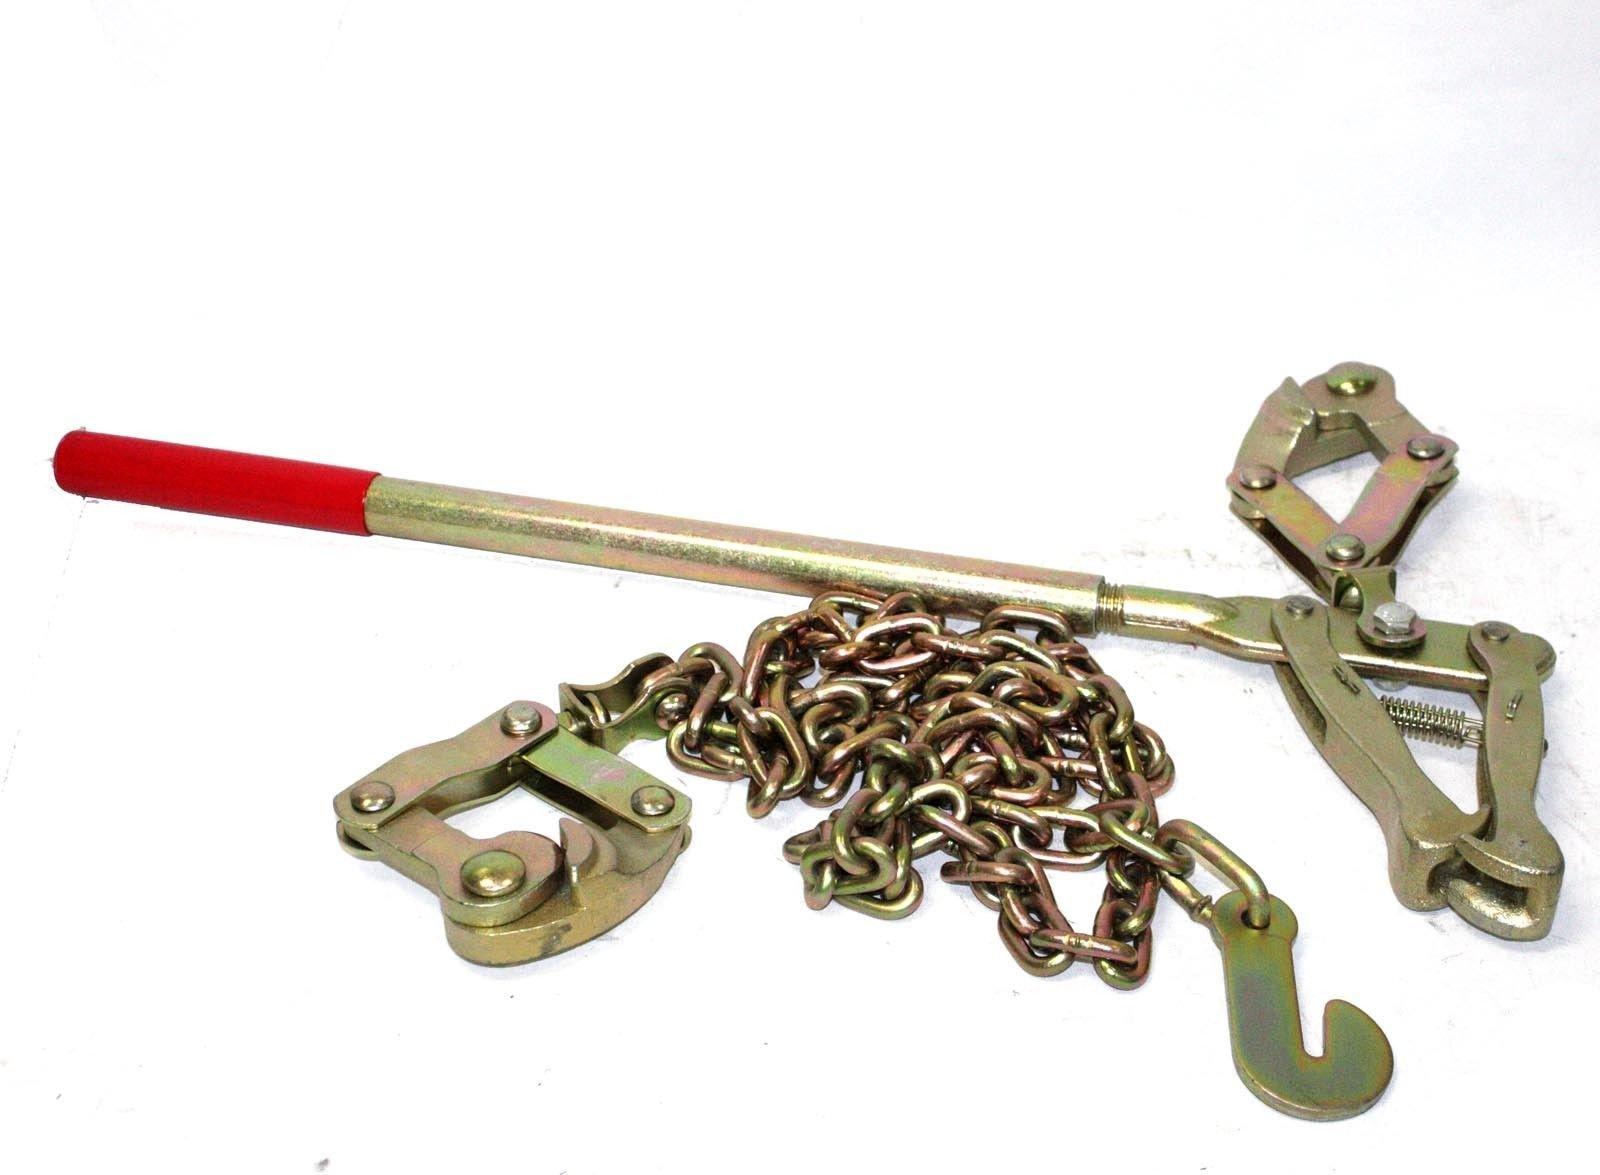 RanchEx Woven Wire Stretcher